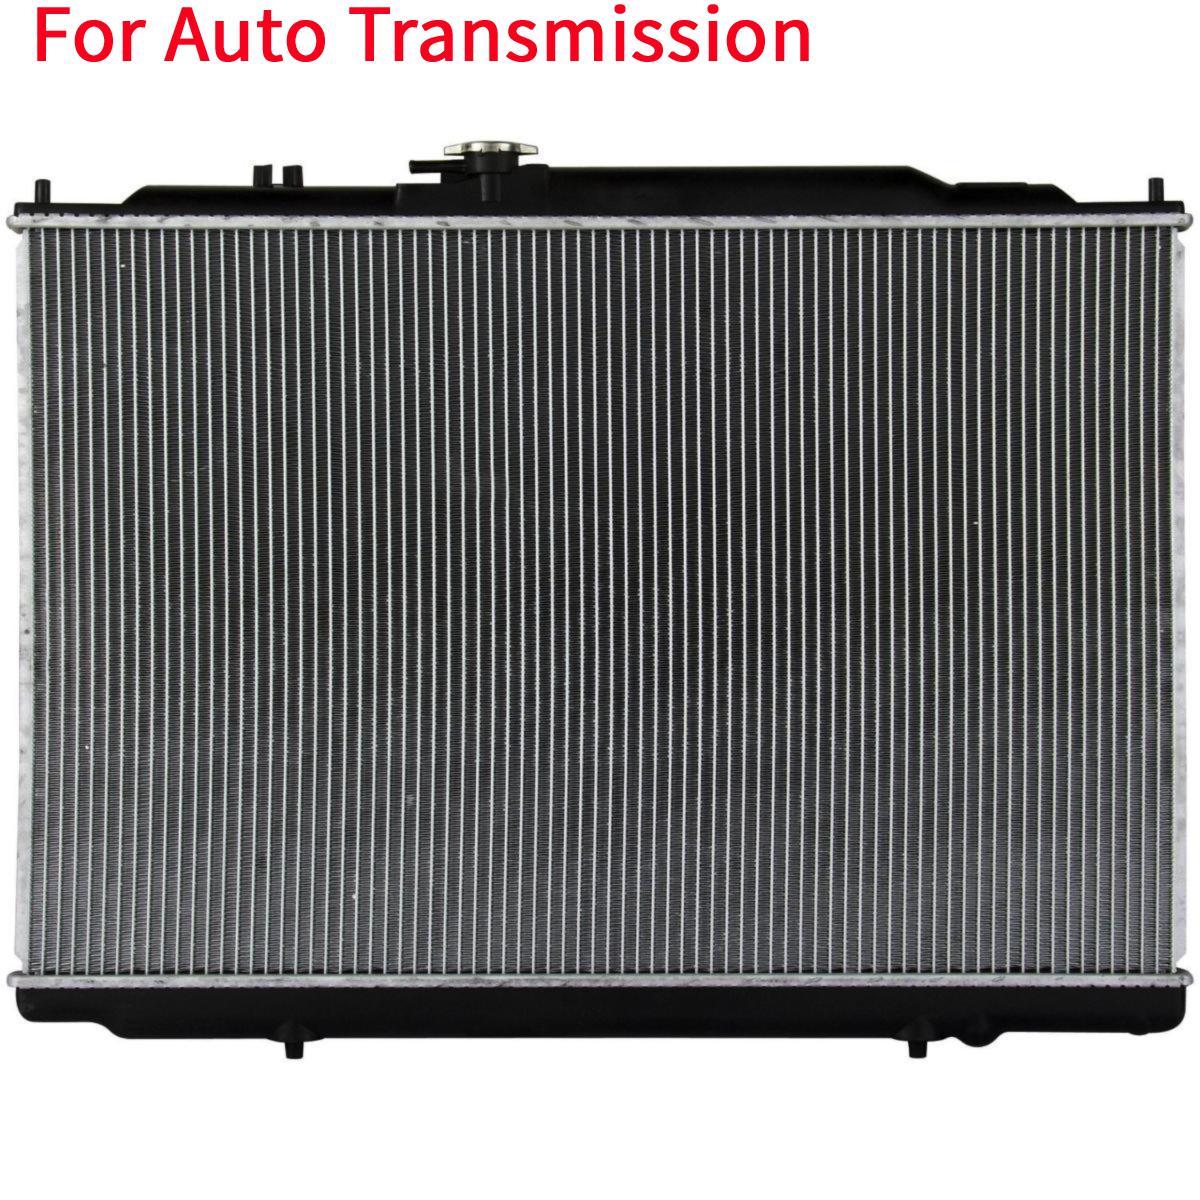 Auto Aluminum Core Radiator For 2003-06 Acura MDX 3.5L